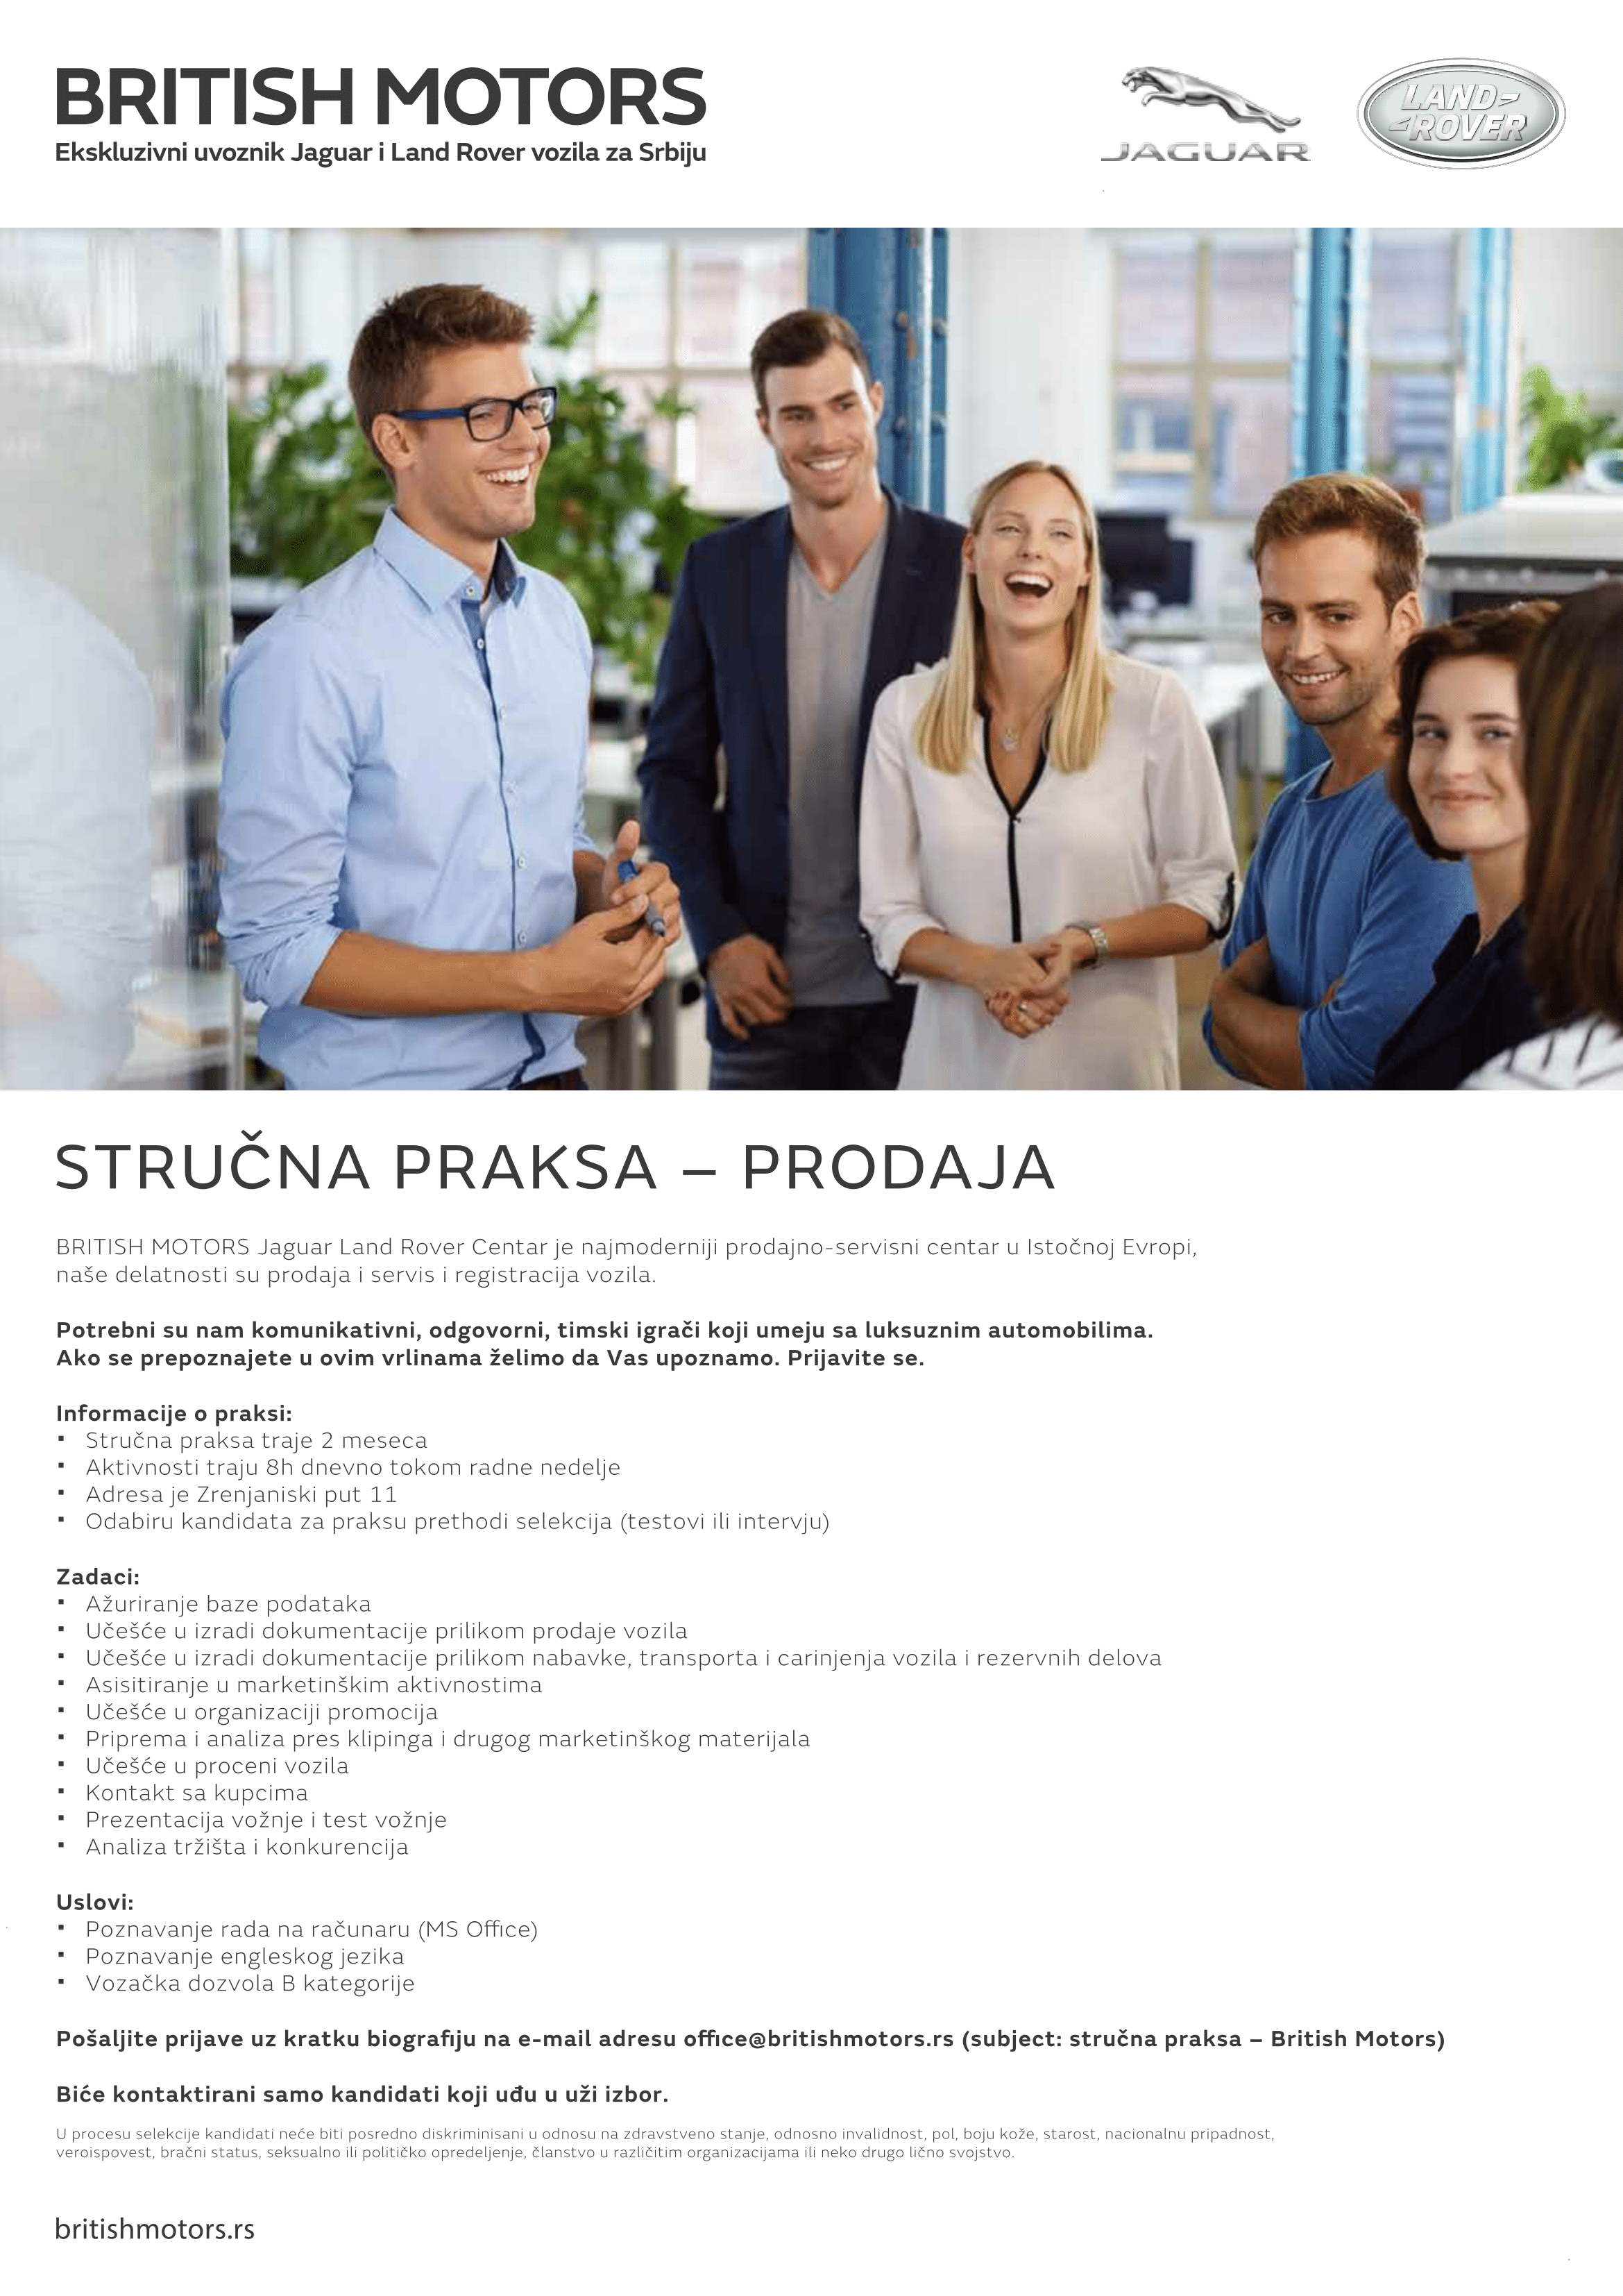 BM_Oglas za praksu_A3_prodaja_PREVIEW (2) (1)-1